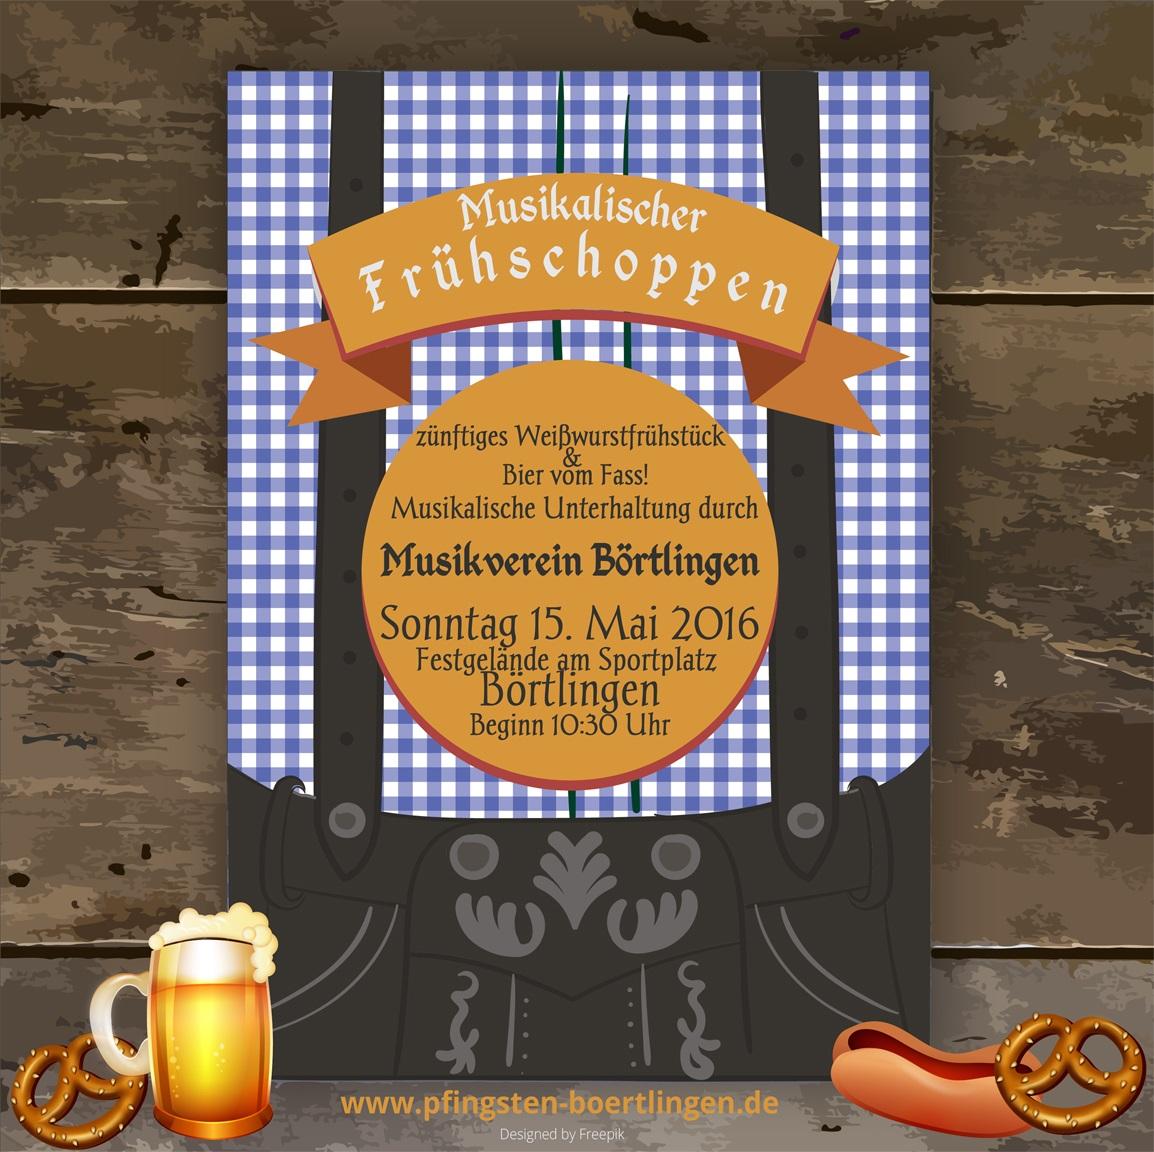 Frühschoppen 40. Pfingstturnier 2016 TV Börtlingen